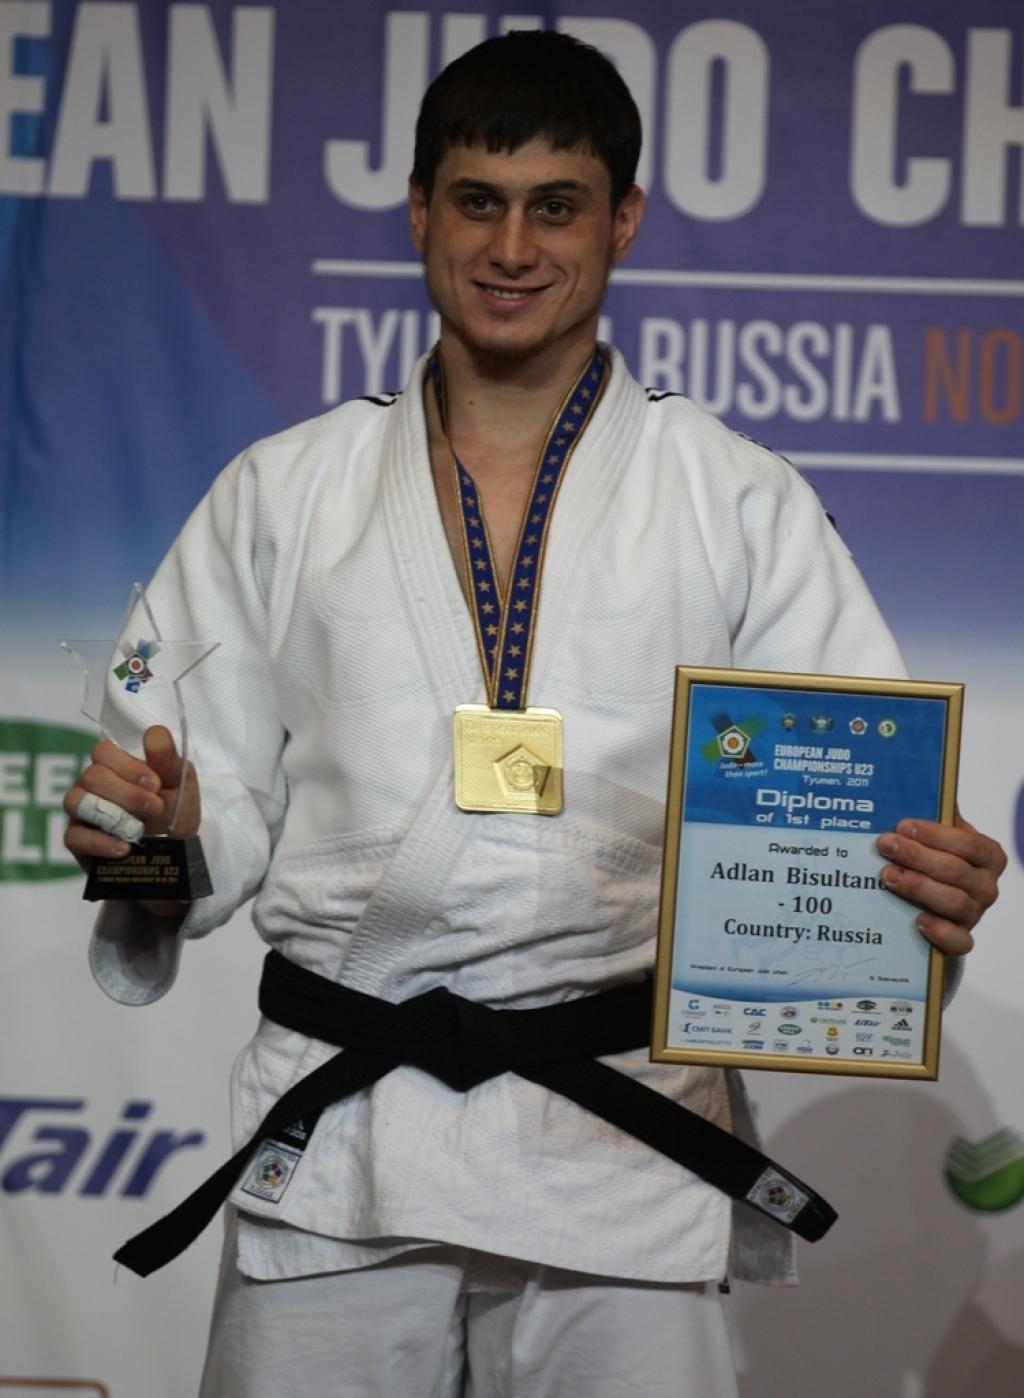 Adlan Bisultanov wins all Russian final